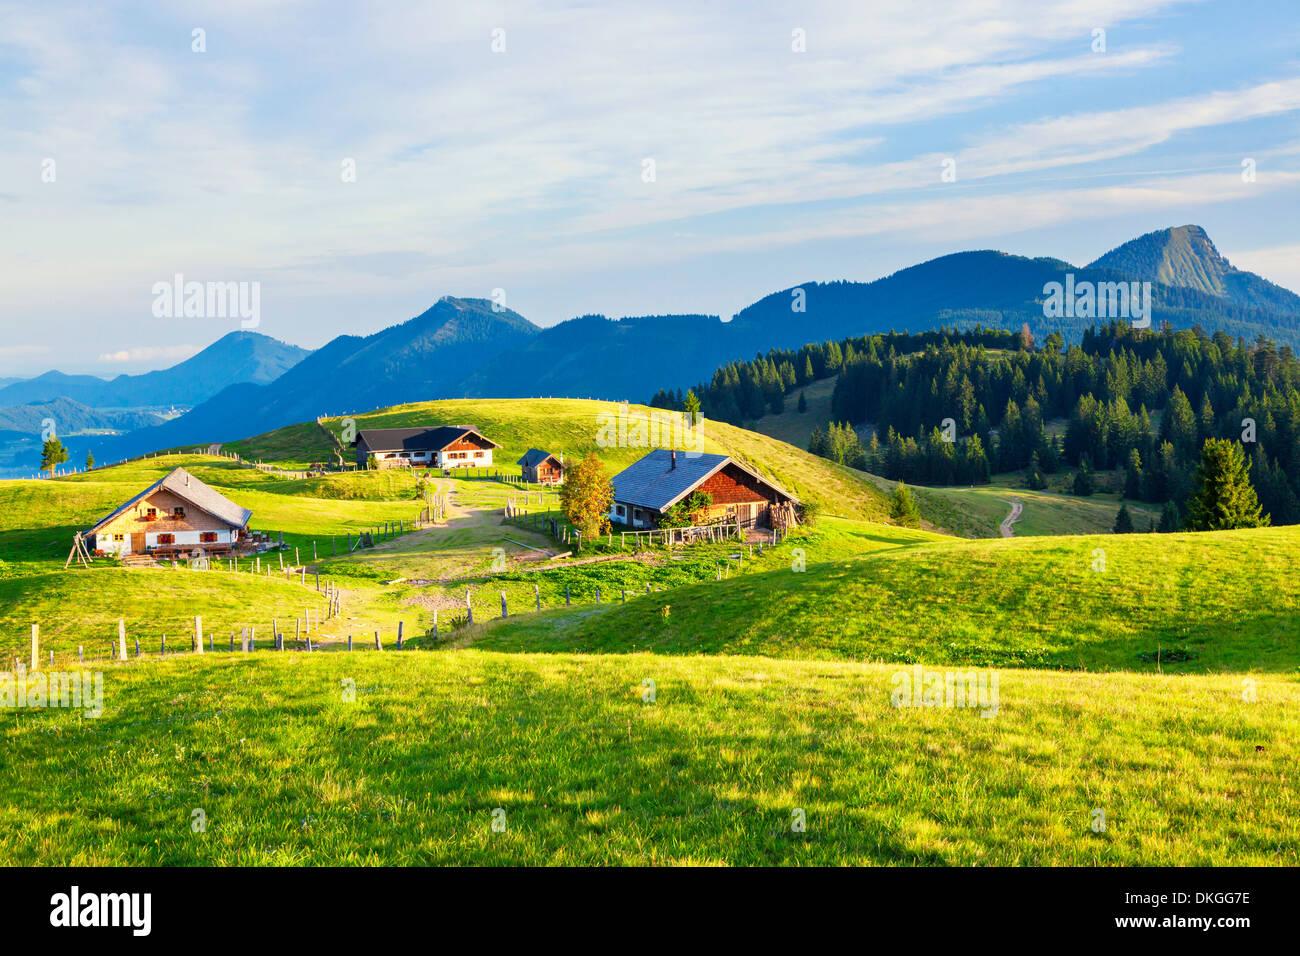 Alp in the Salzkammergut Mountains, Austria Stock Photo